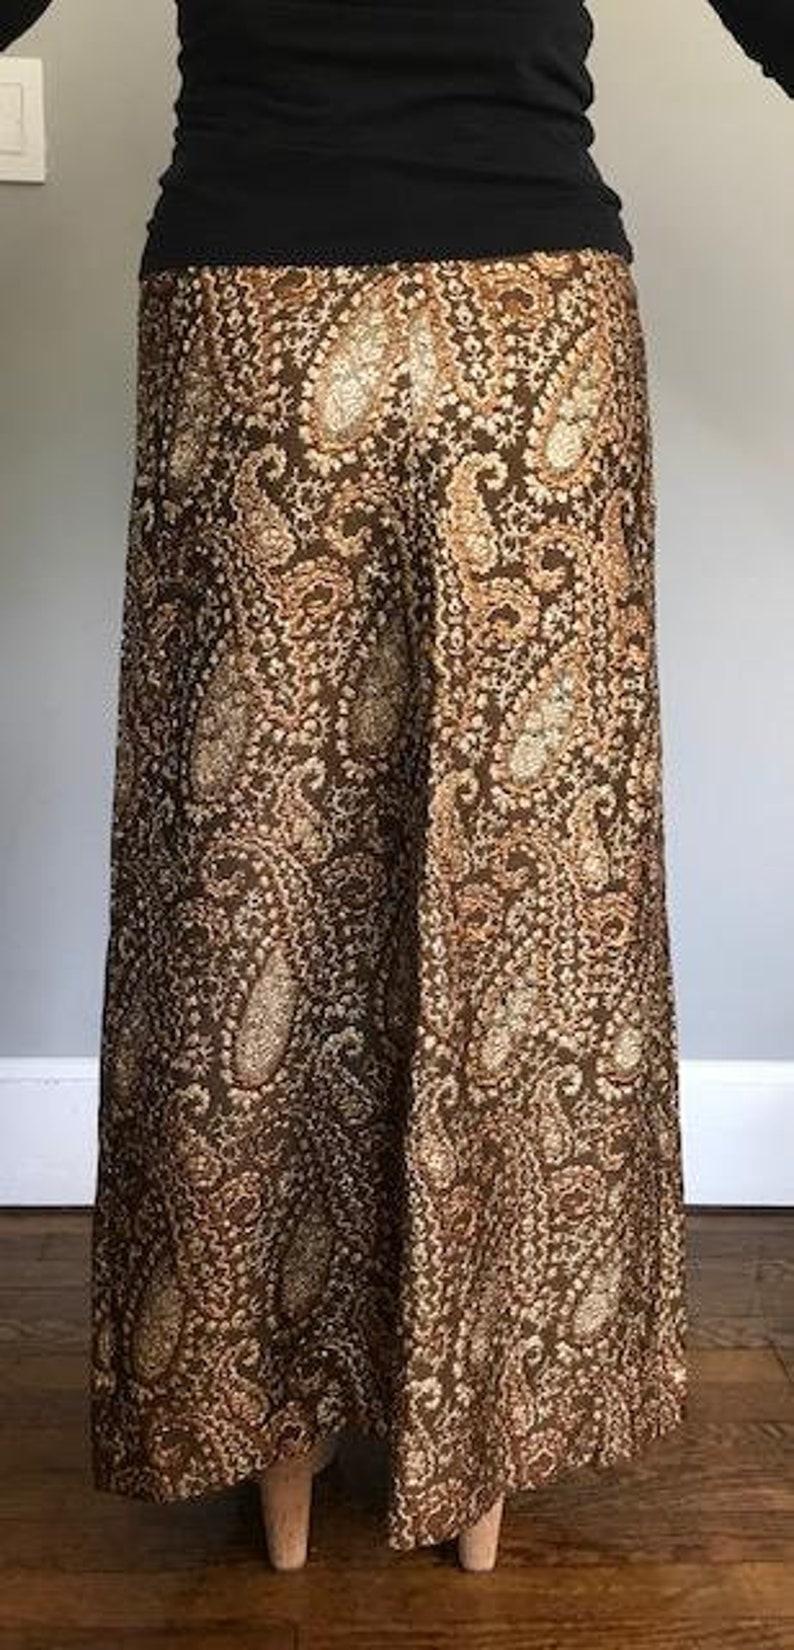 SALE-Vintage Brocade Gold Metallic Paisley Maxi Skirt 1960/'s-1970/'s Peck /& Peck 5th Avenue NYC